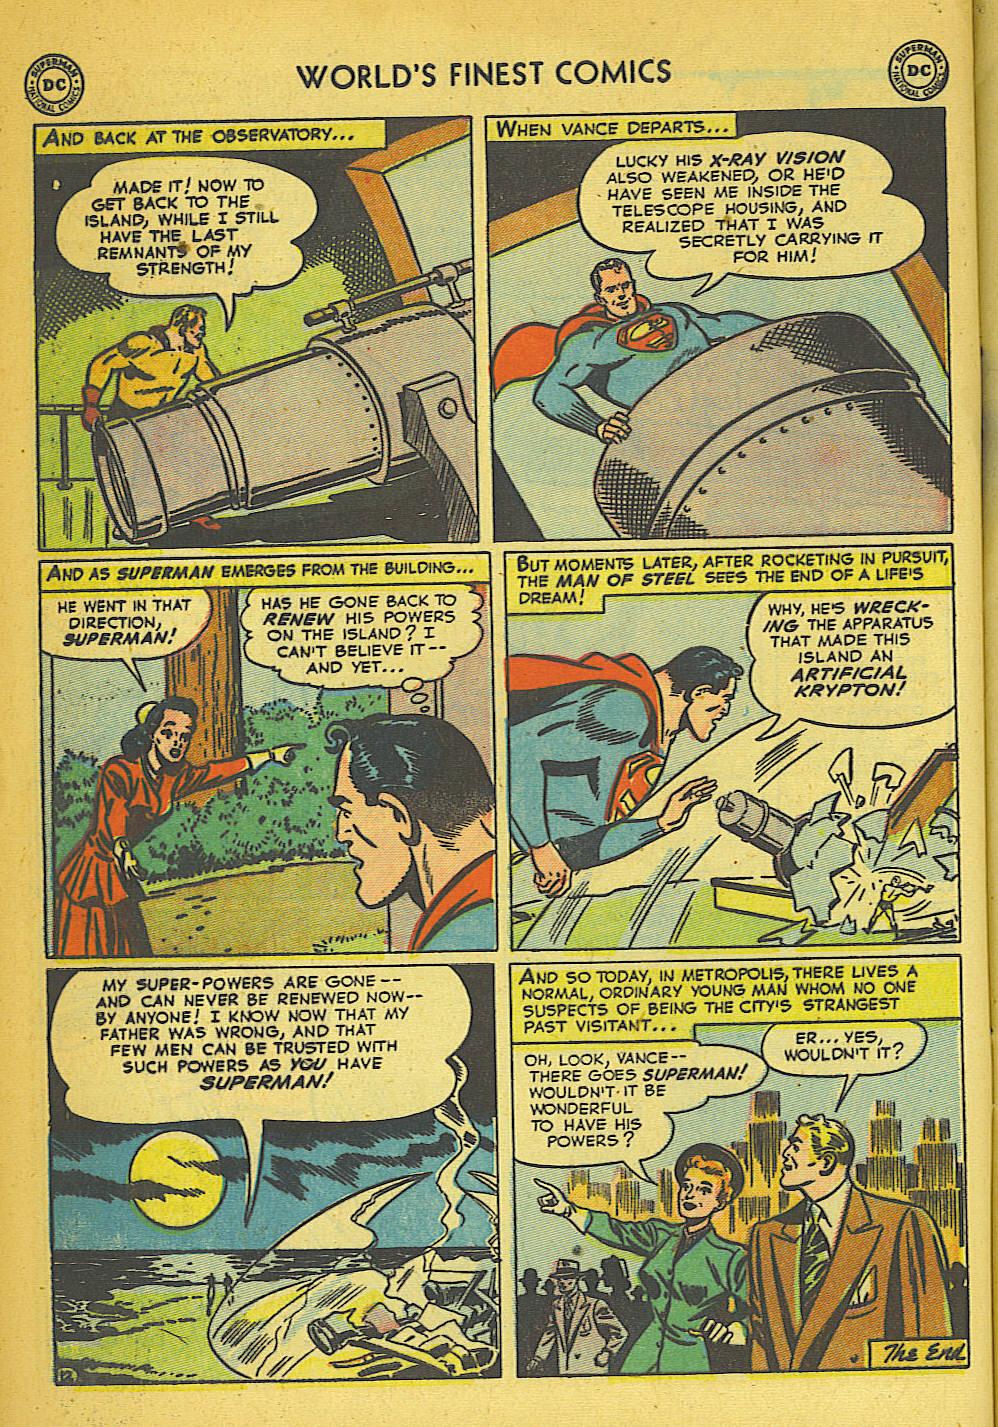 Read online World's Finest Comics comic -  Issue #57 - 14